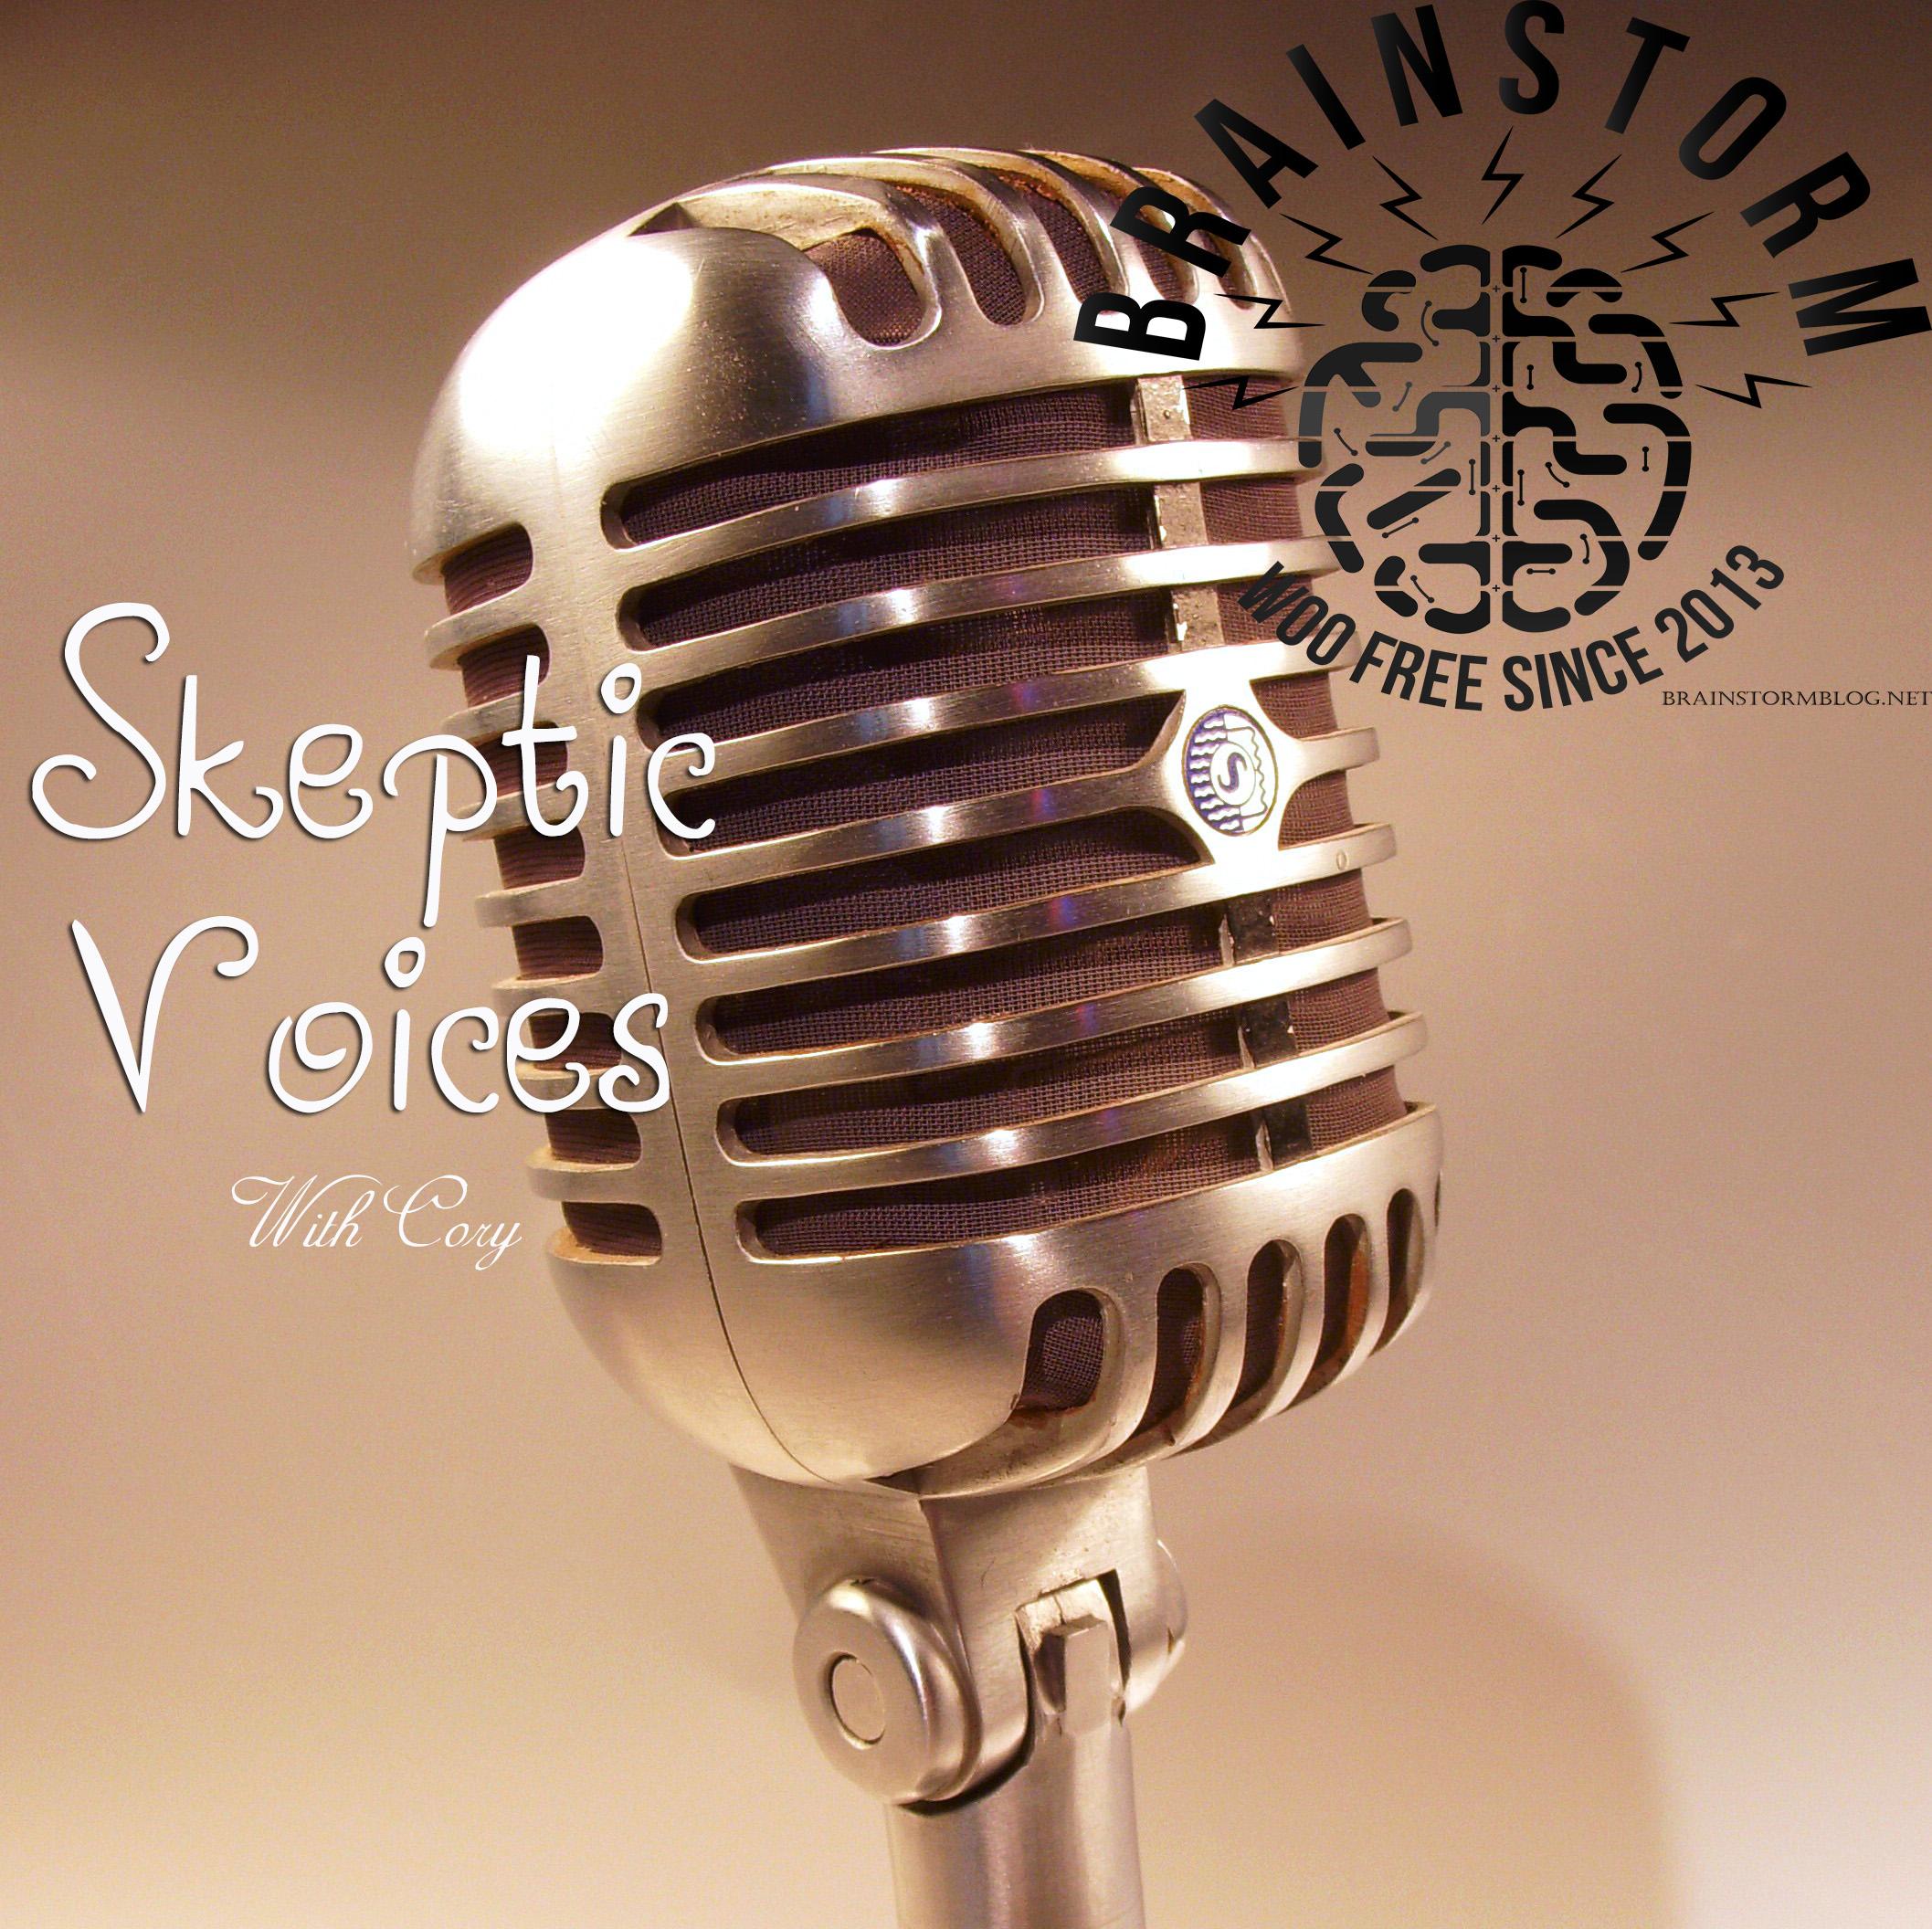 Skeptic Voices.jpg